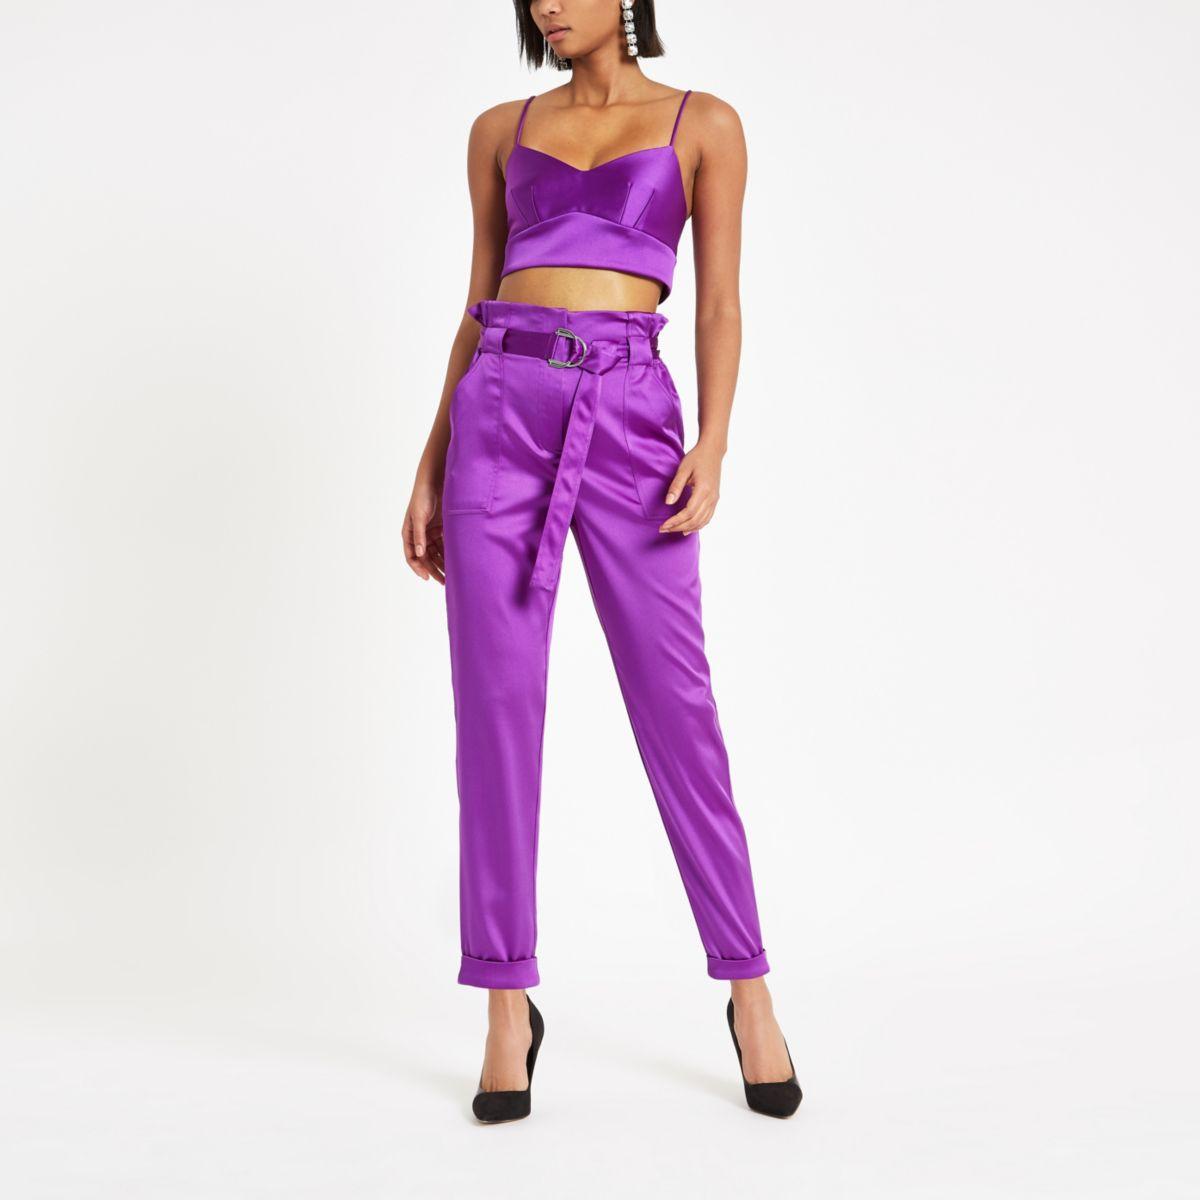 Purple satin bralet